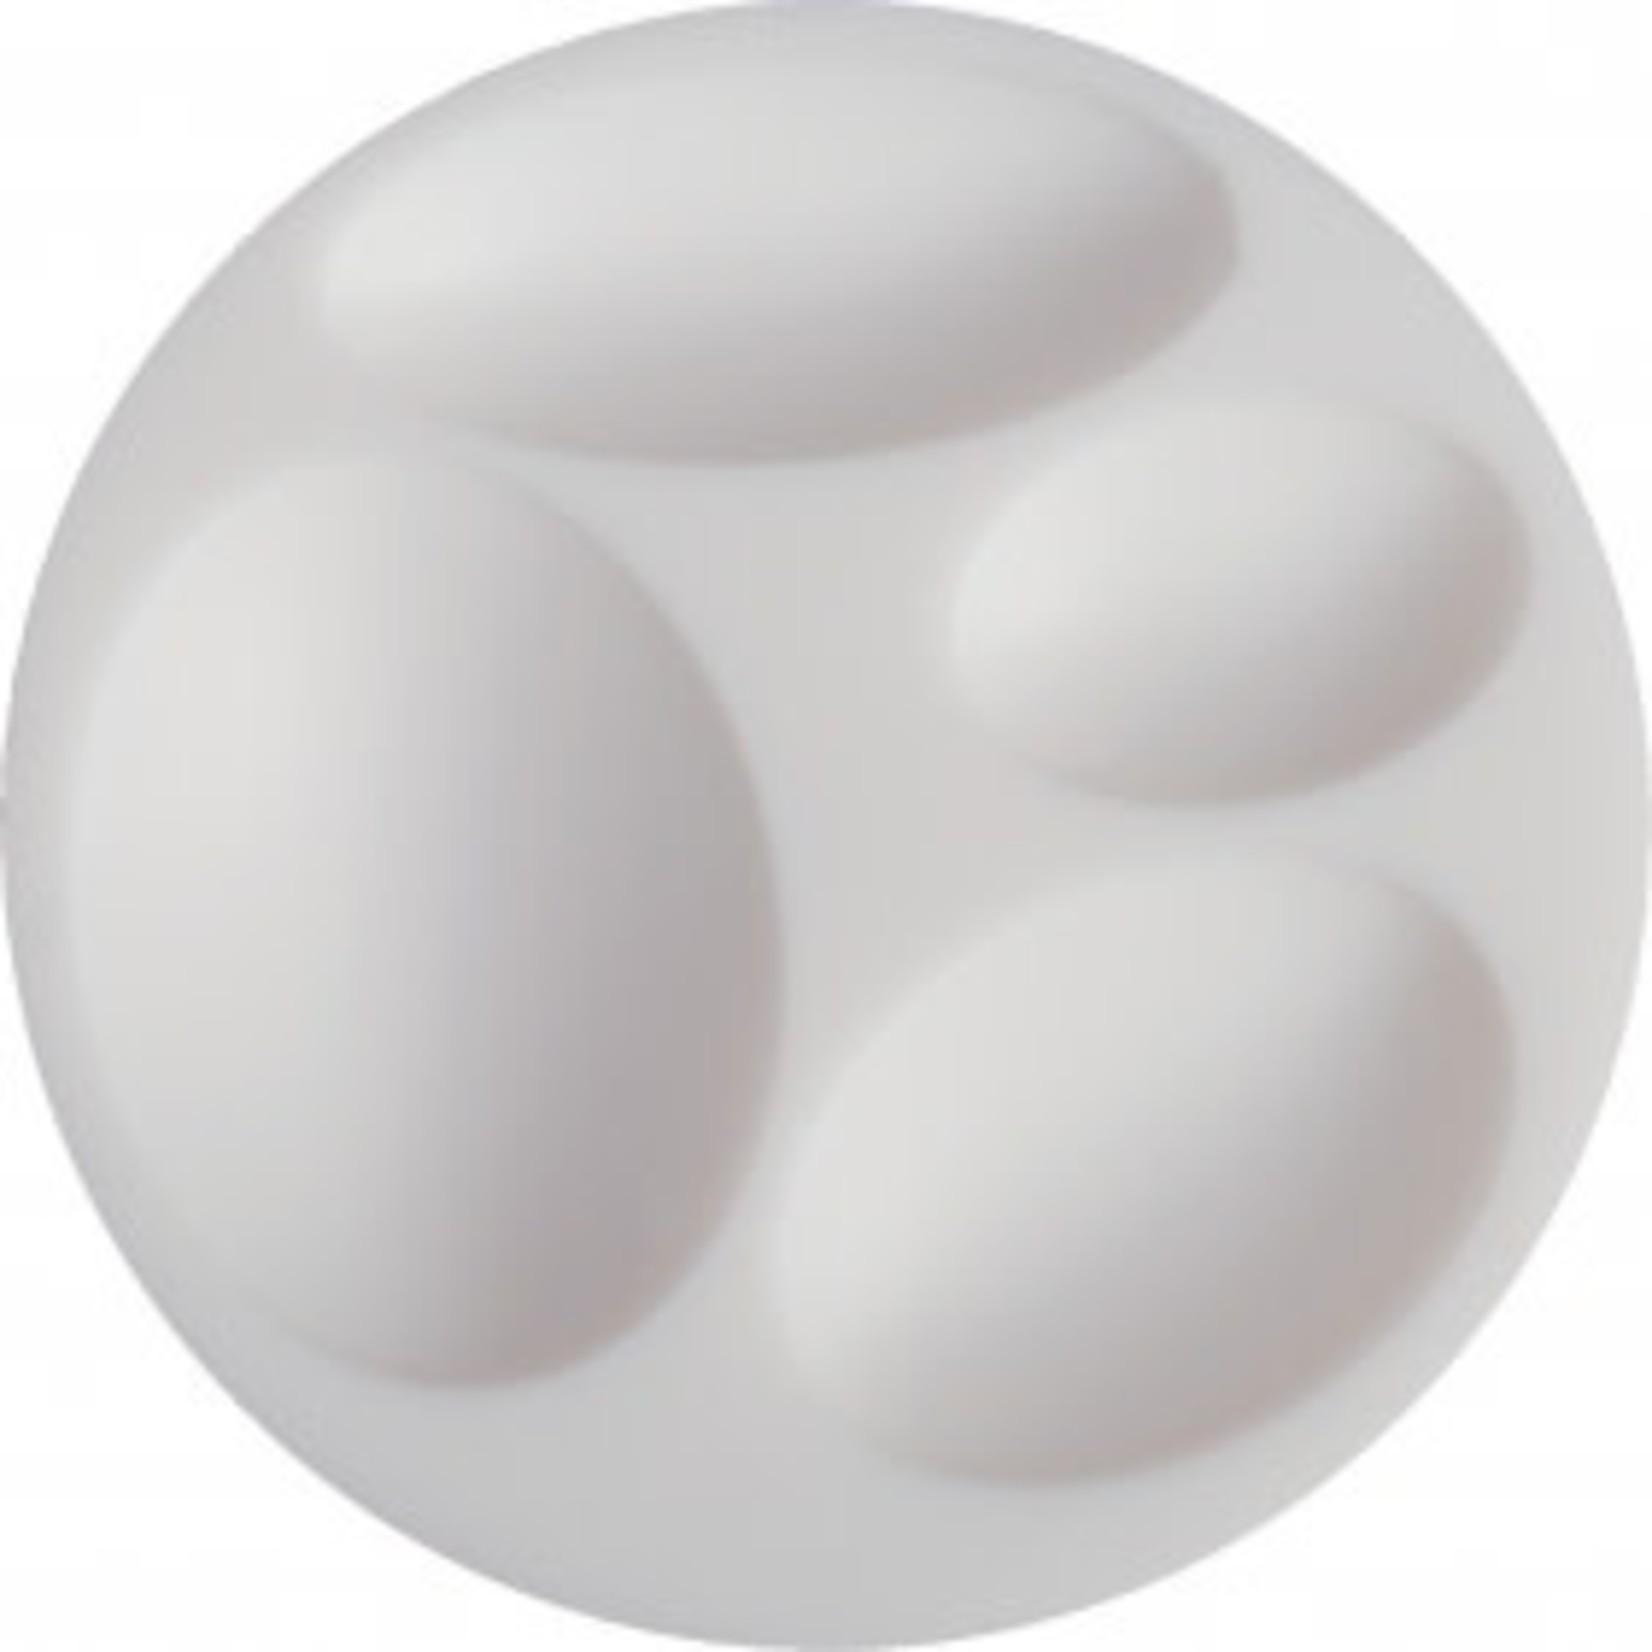 Cernit Cernit Silicone Mold - Oval Cabochons